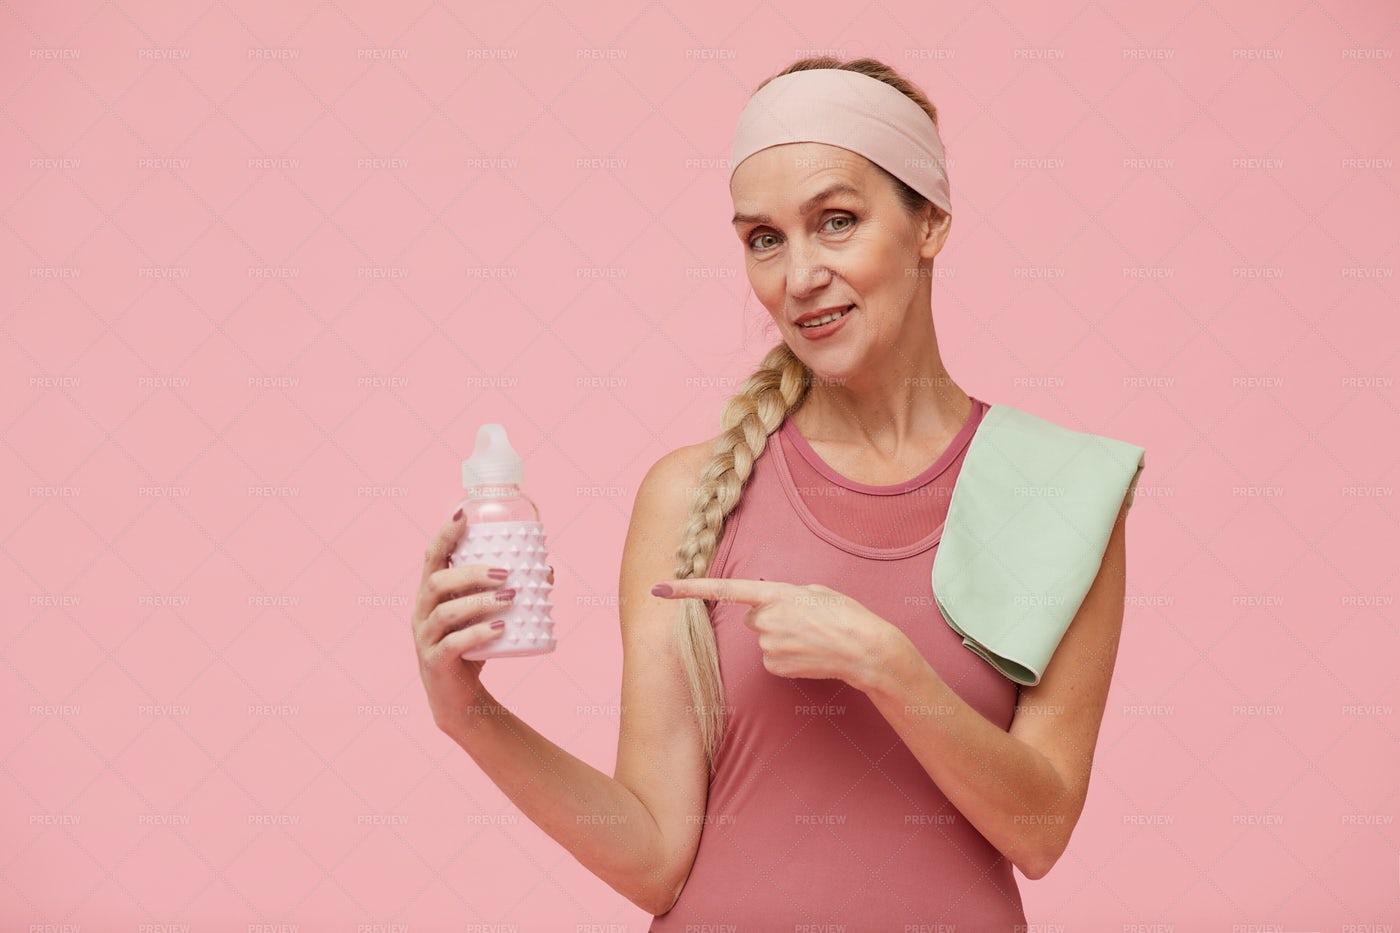 Sportive Matre Woman Holding Water...: Stock Photos